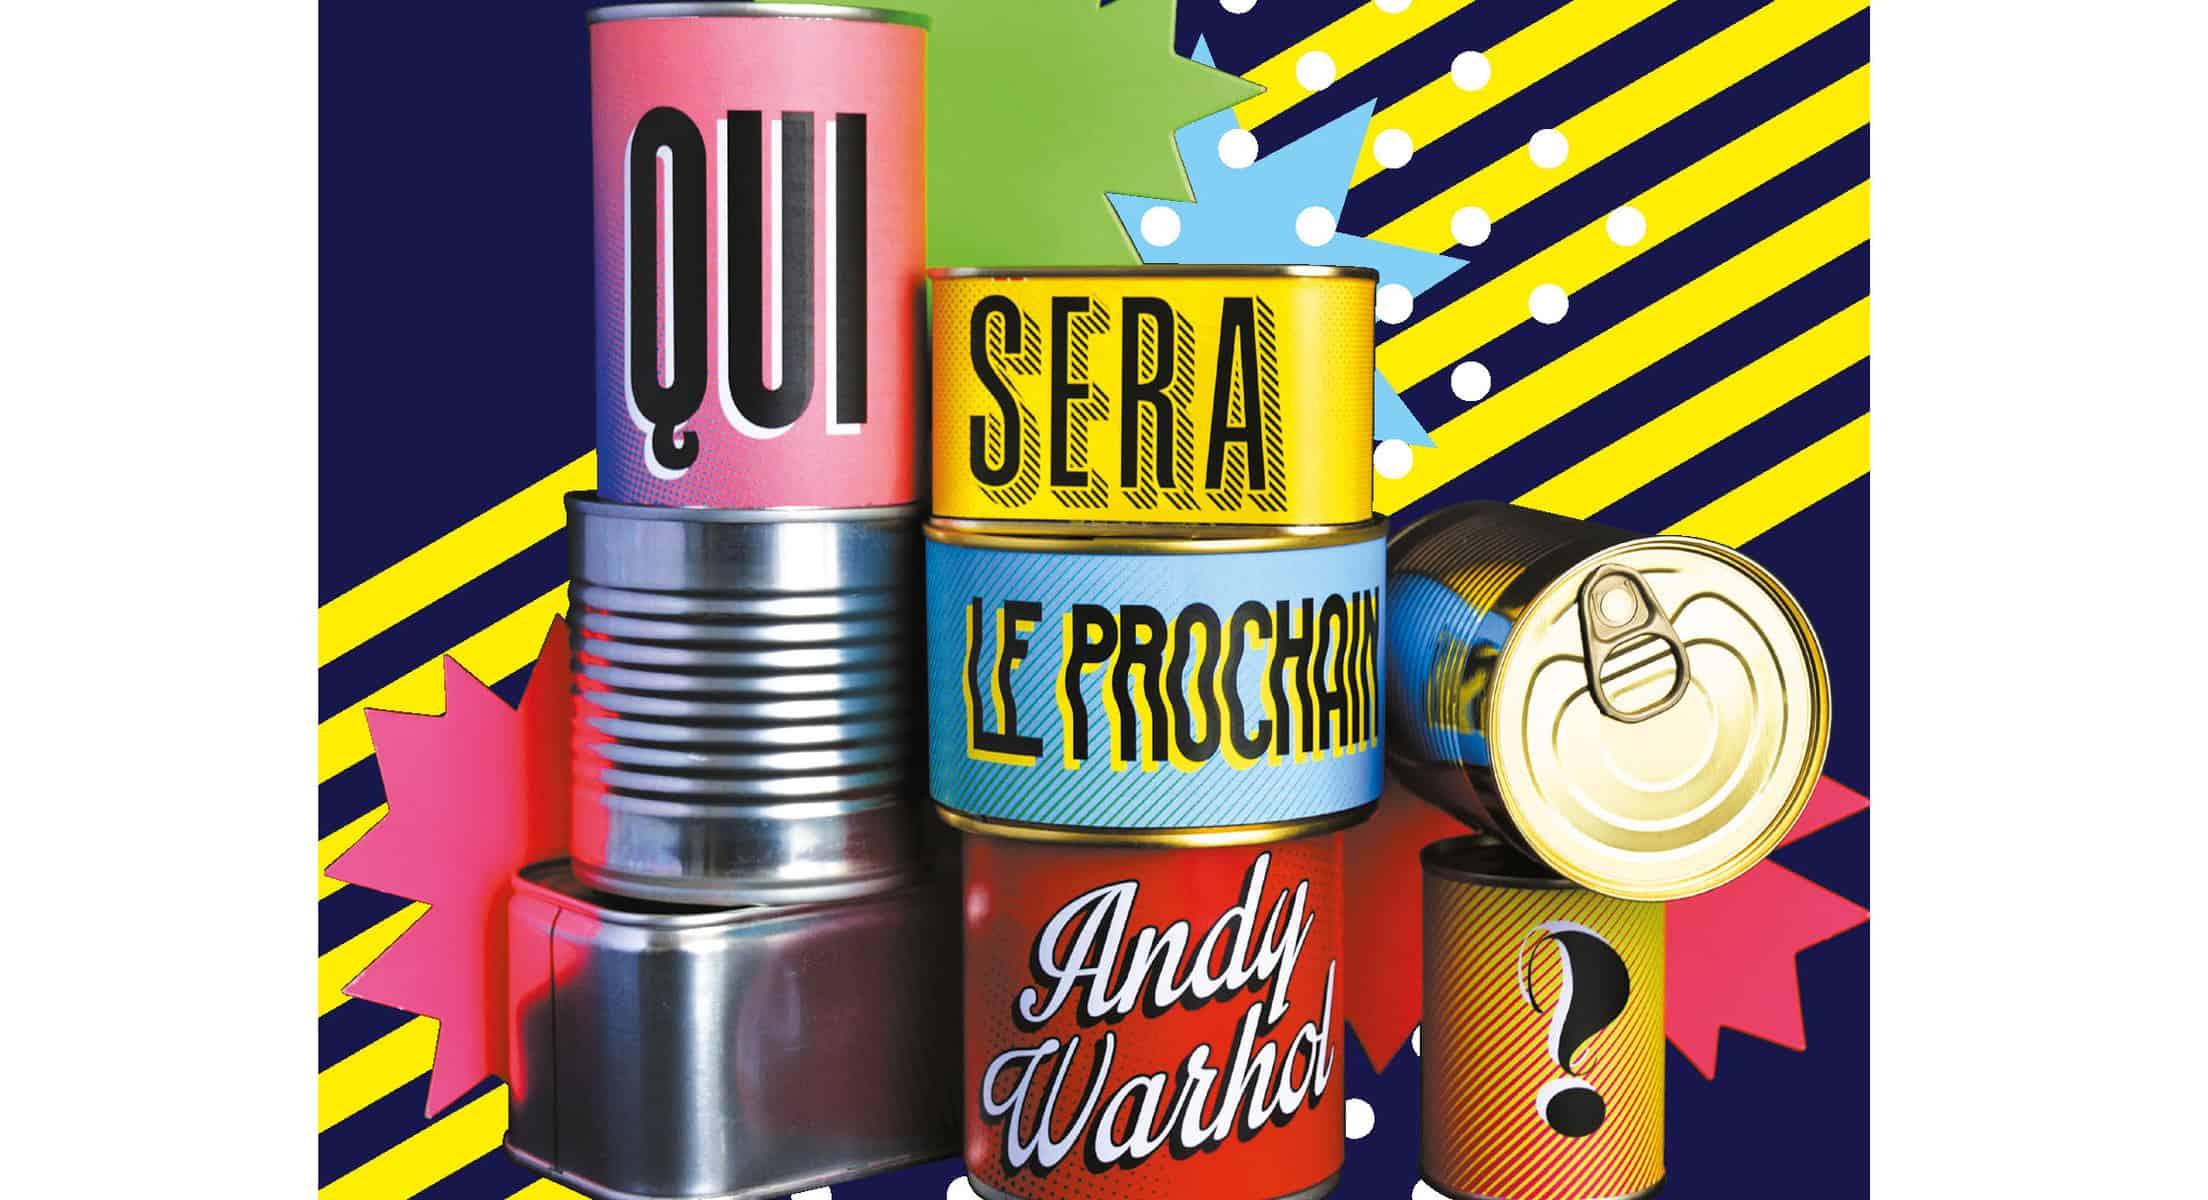 Qui sera le prochain Andy Warhol ?